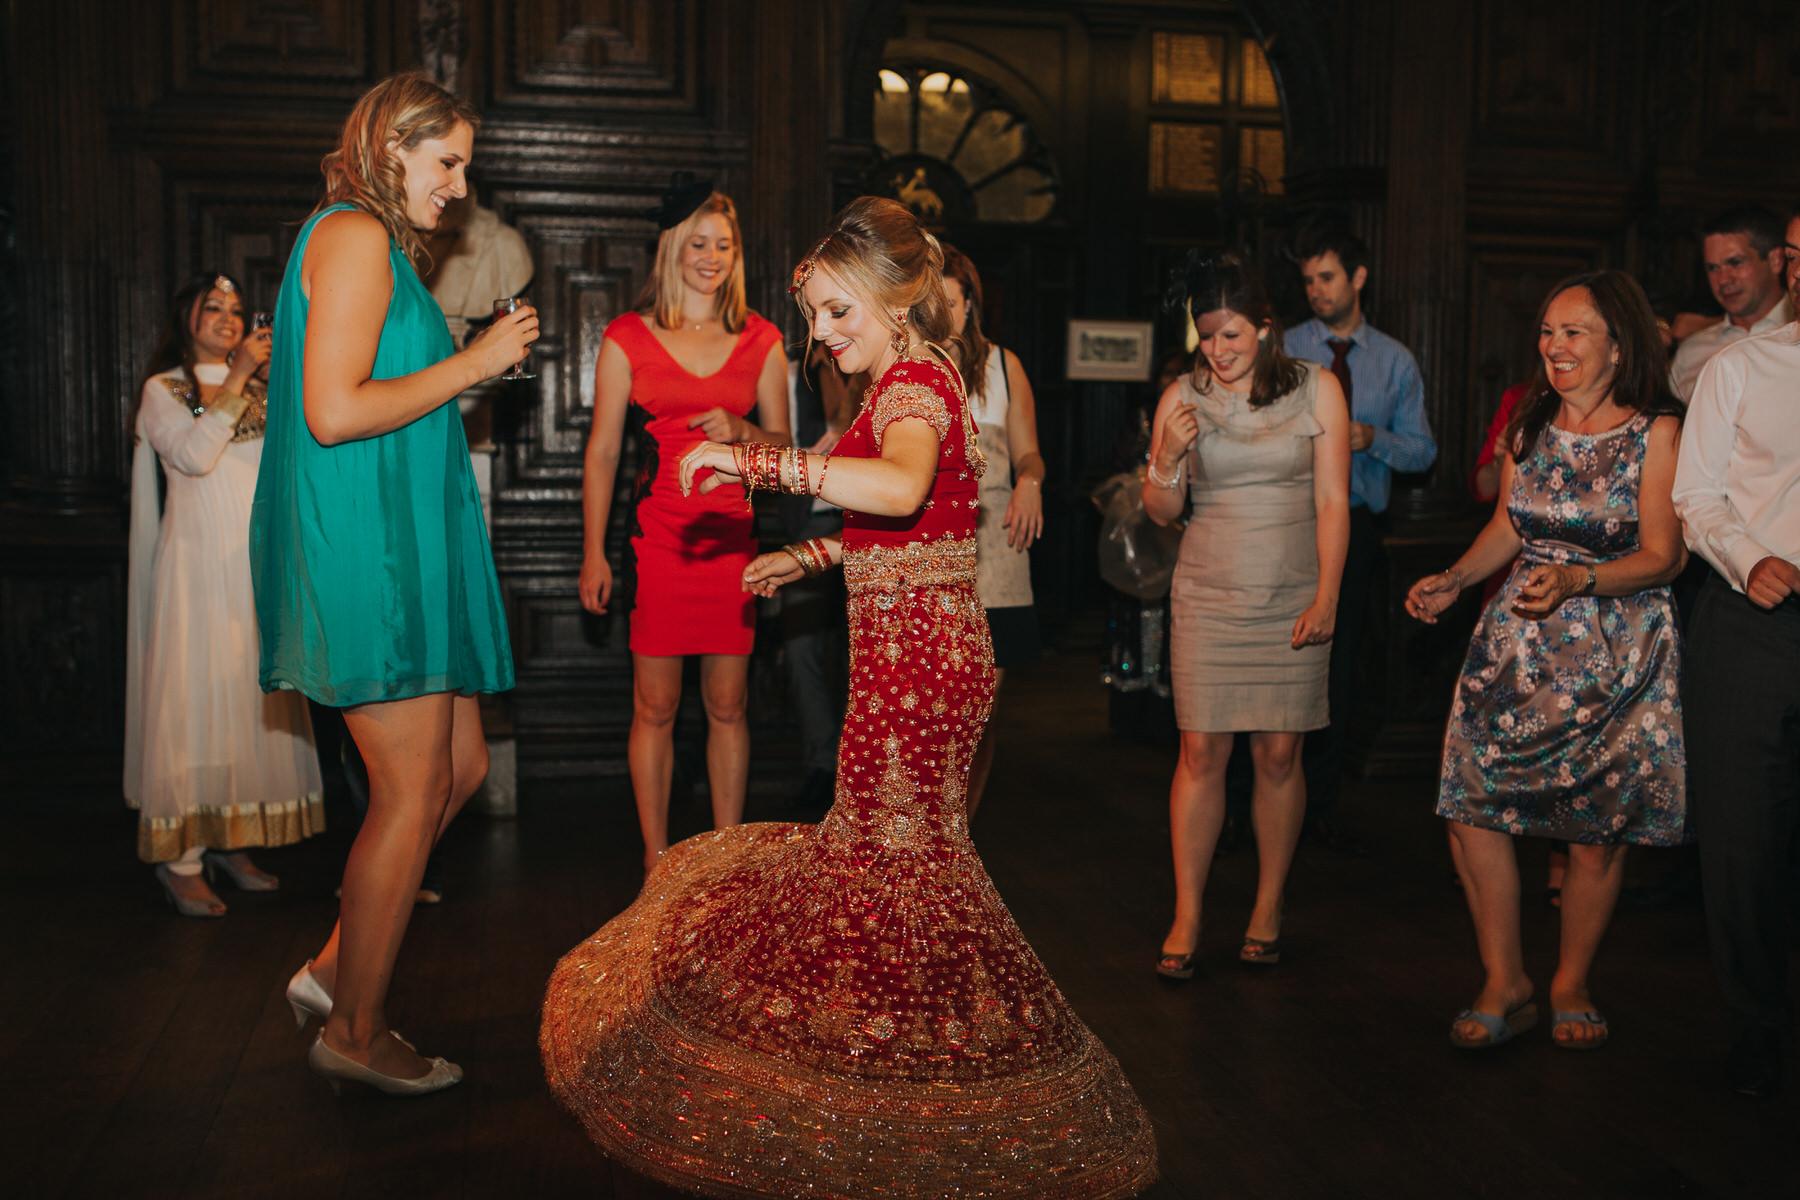 244-Anglo-Asian-London-Wedding-bride-dancing-red-sari.jpg